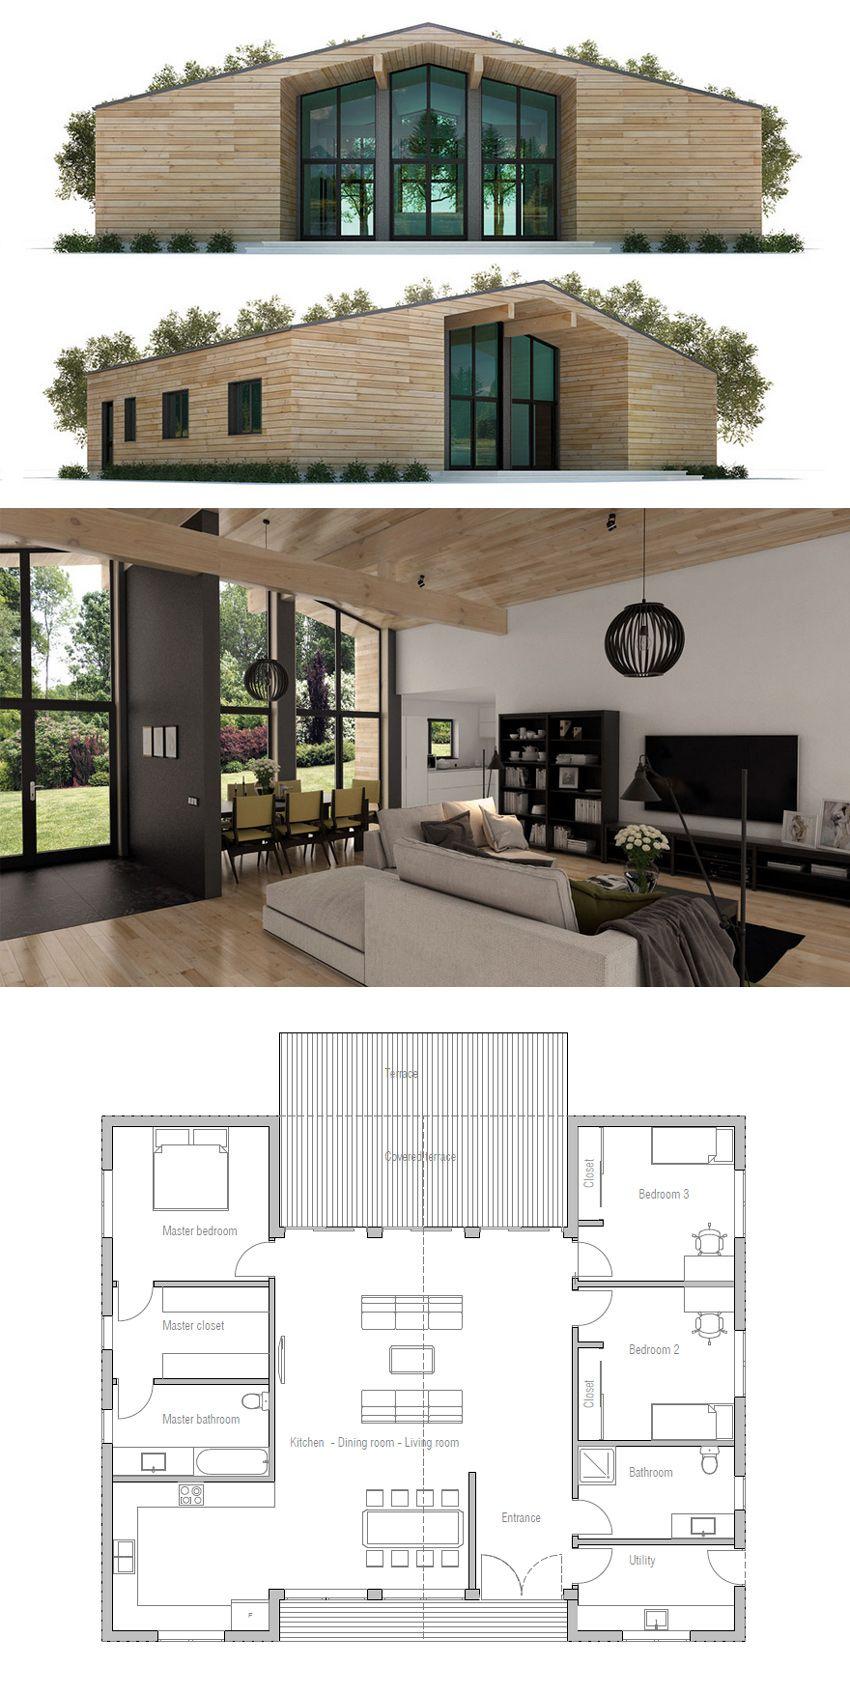 Hausplan | Interior Design House / Wohnideen Haus | Pinterest ...